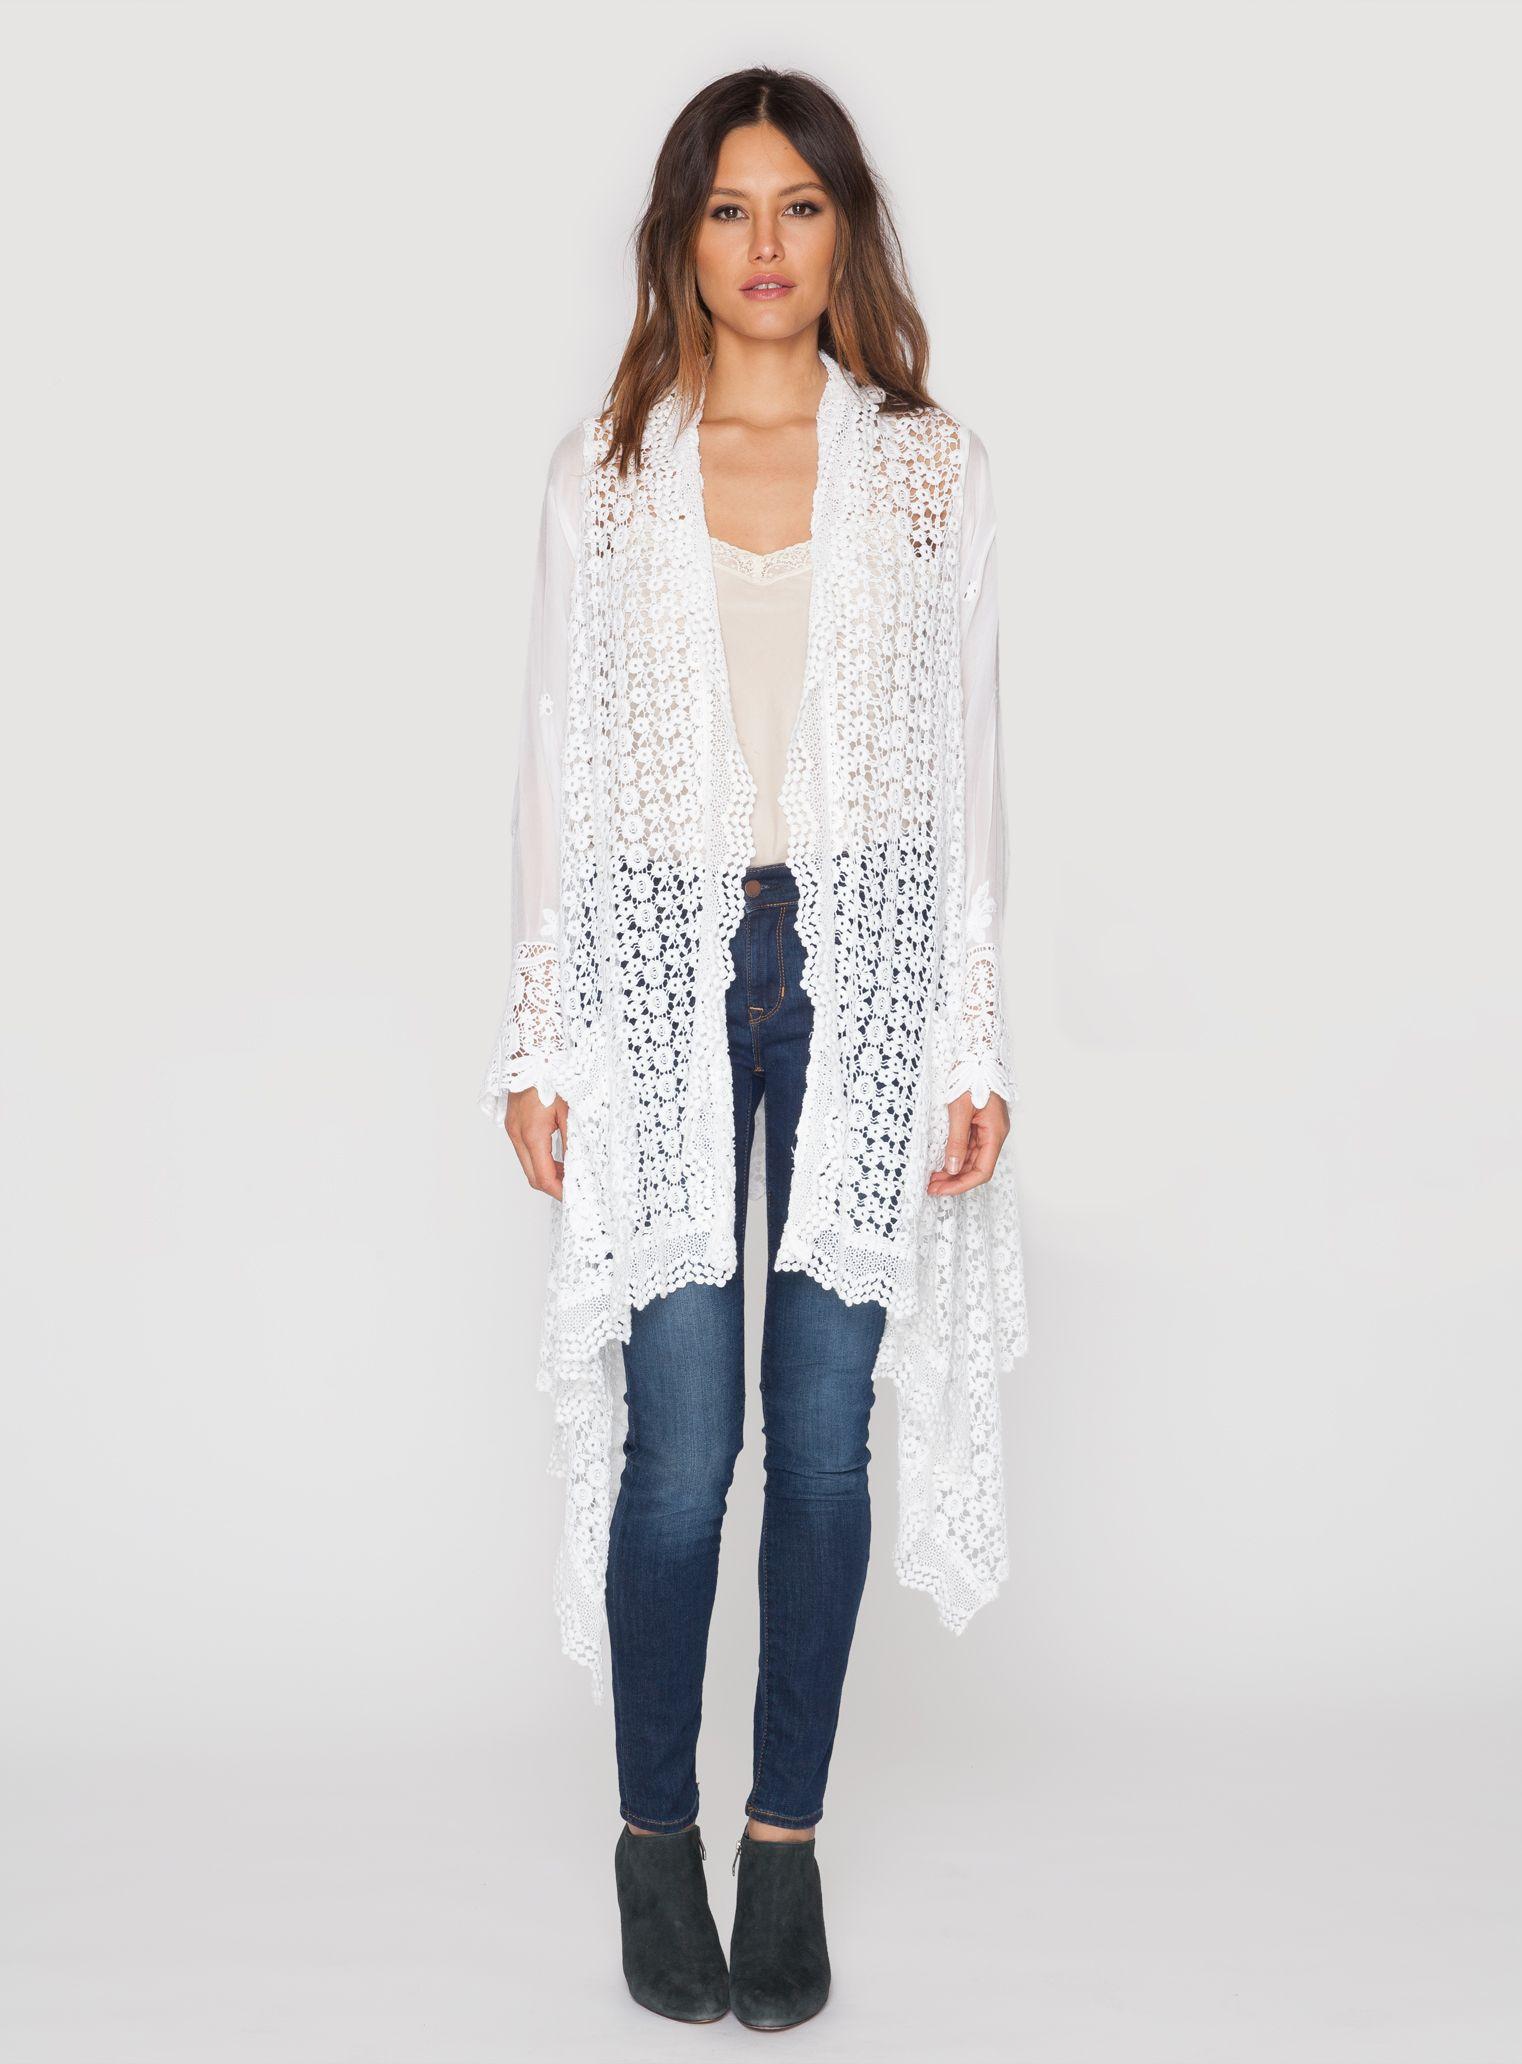 Johnny Was Long Crochet Open Jacket Natural Women S Plus Size Clothing Sale Sweaters For Women Outerwear Women